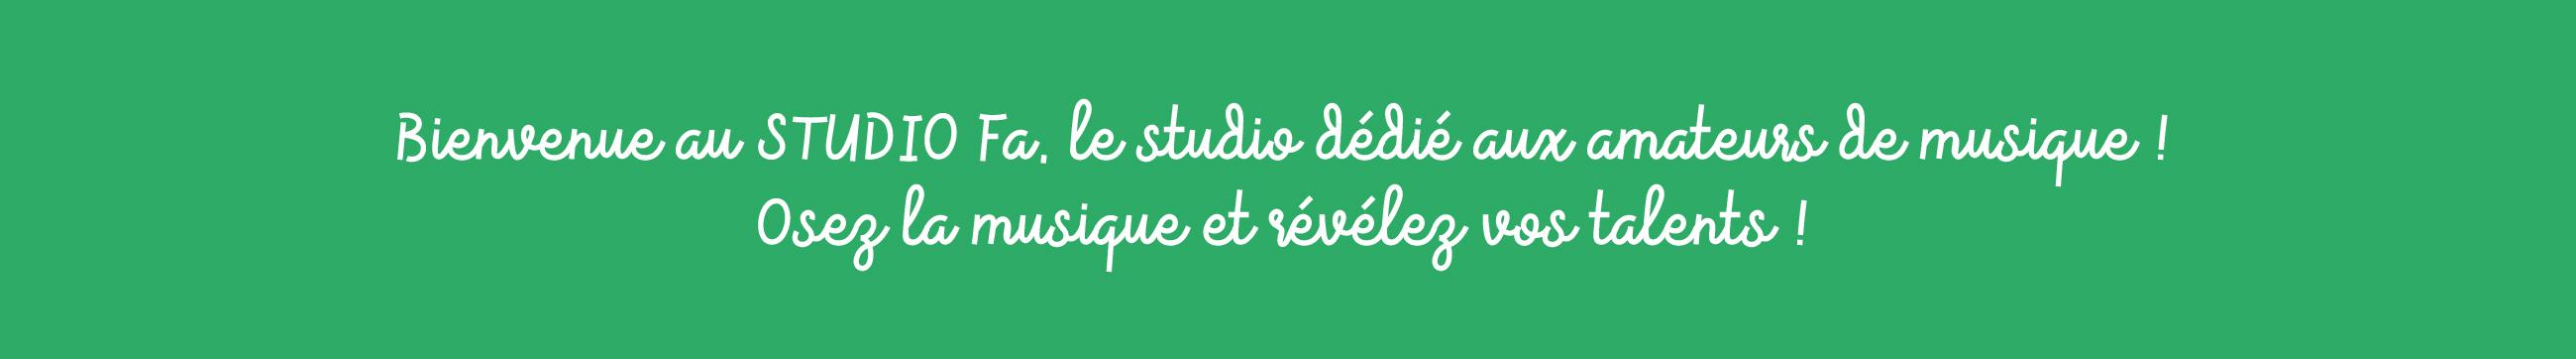 bienvenue au studio fa